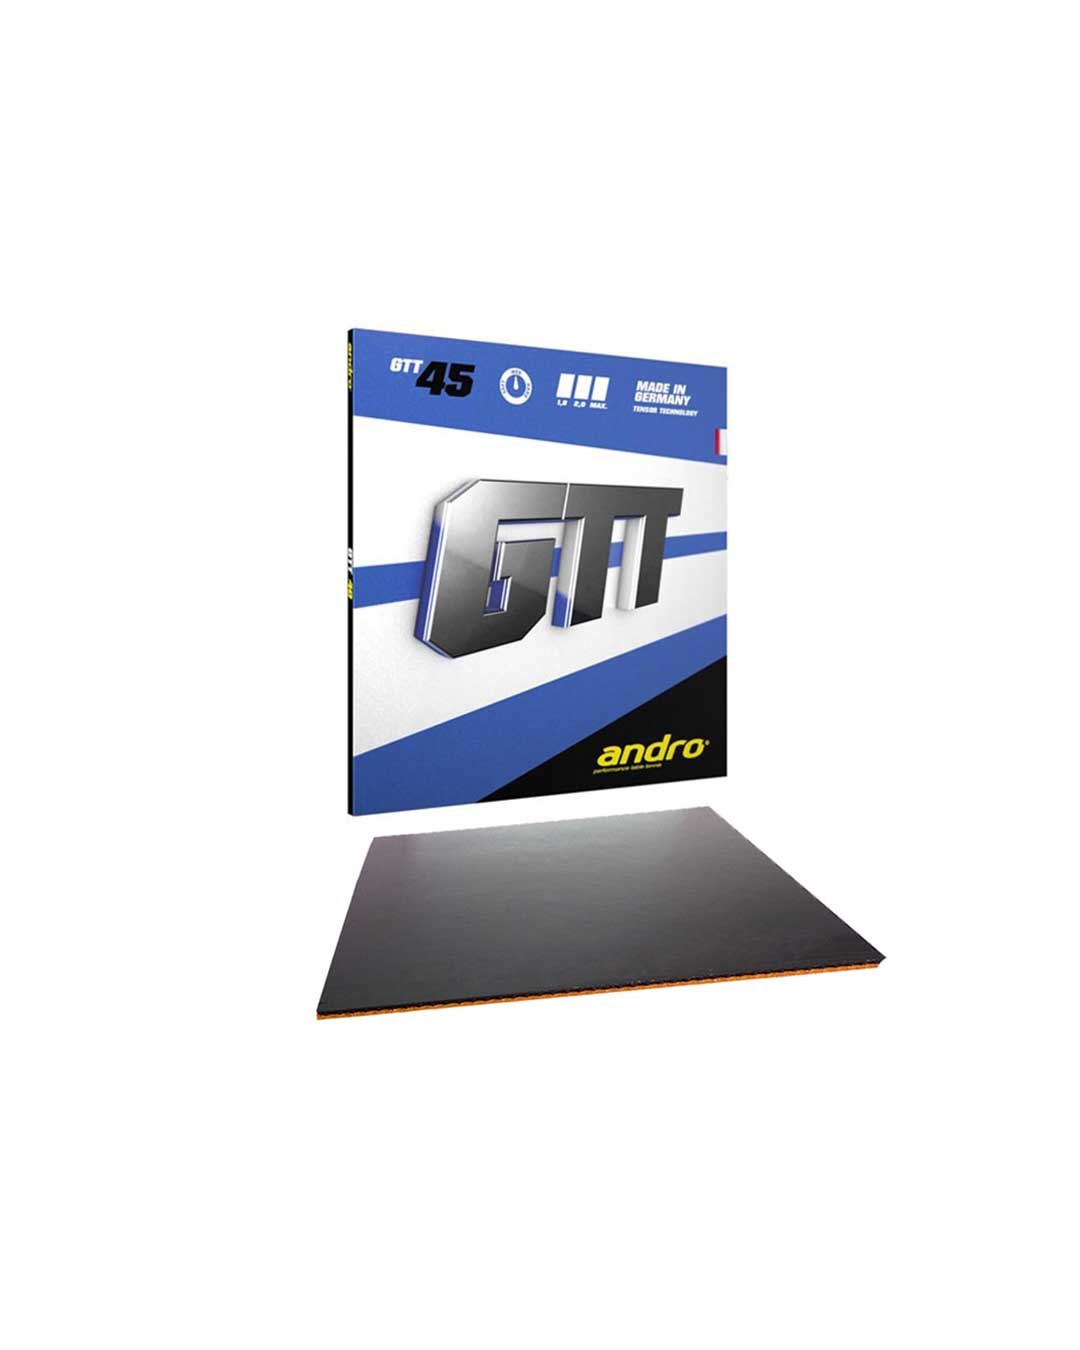 Goma Tenis de Mesa Andro GTT 45 Black 2.2 mm